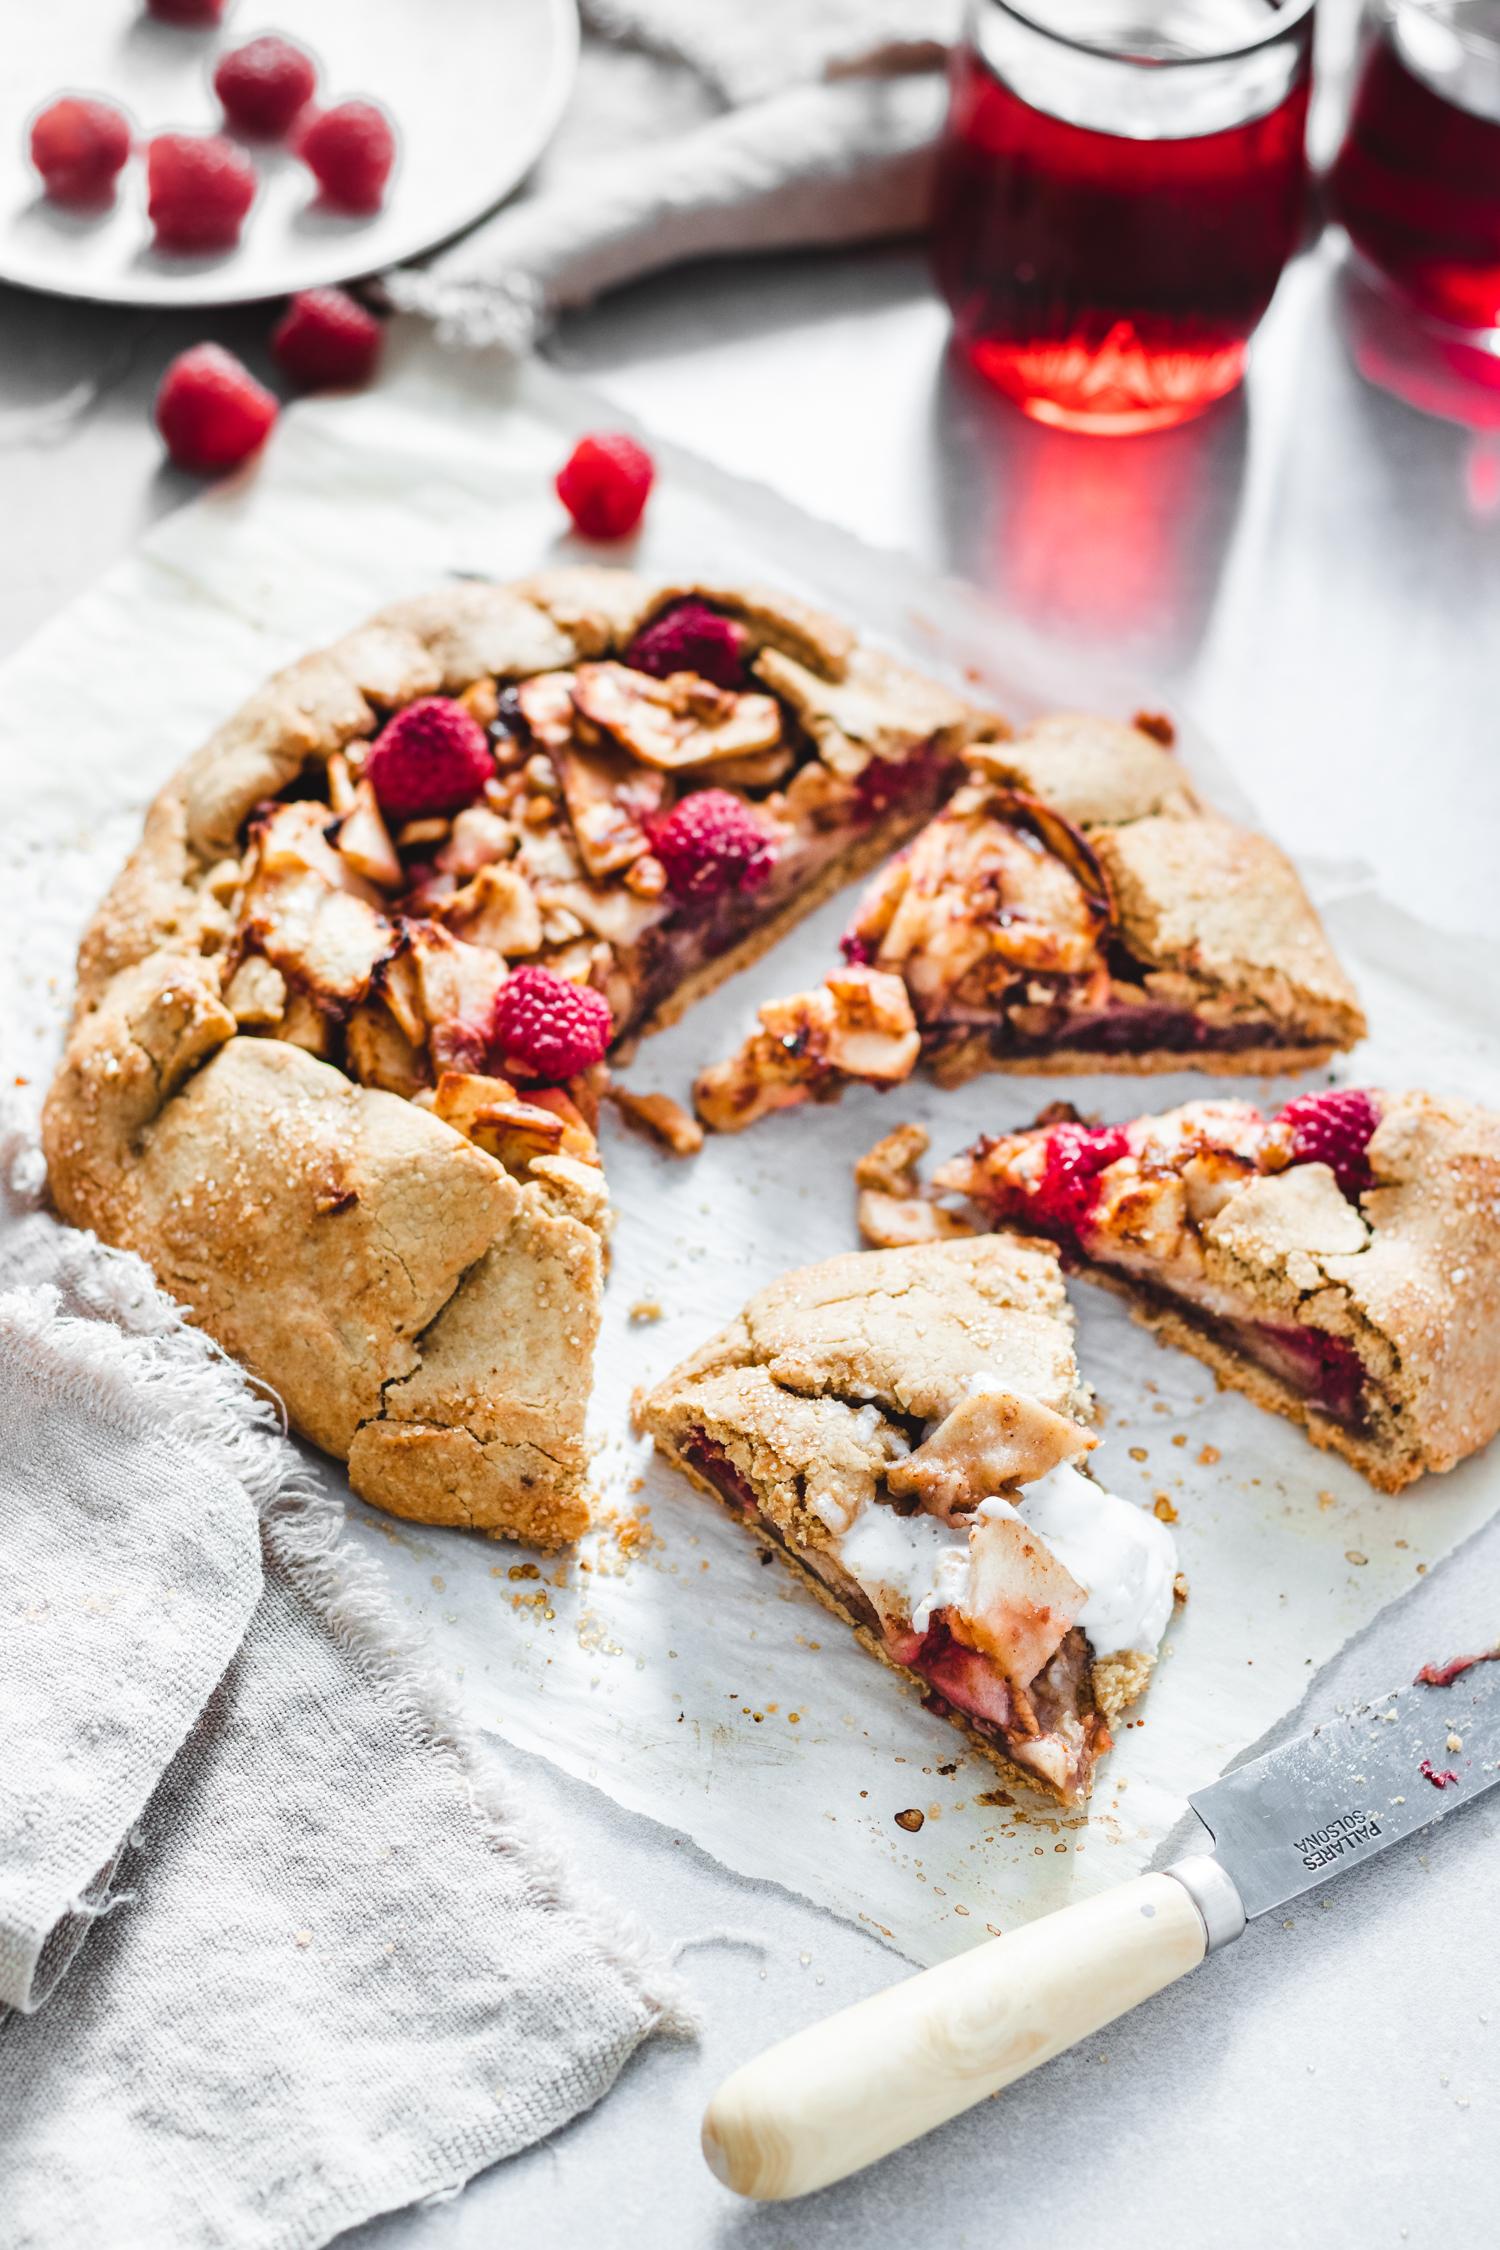 Raspberry and Apple Galette (Gluten Free & Vegan)